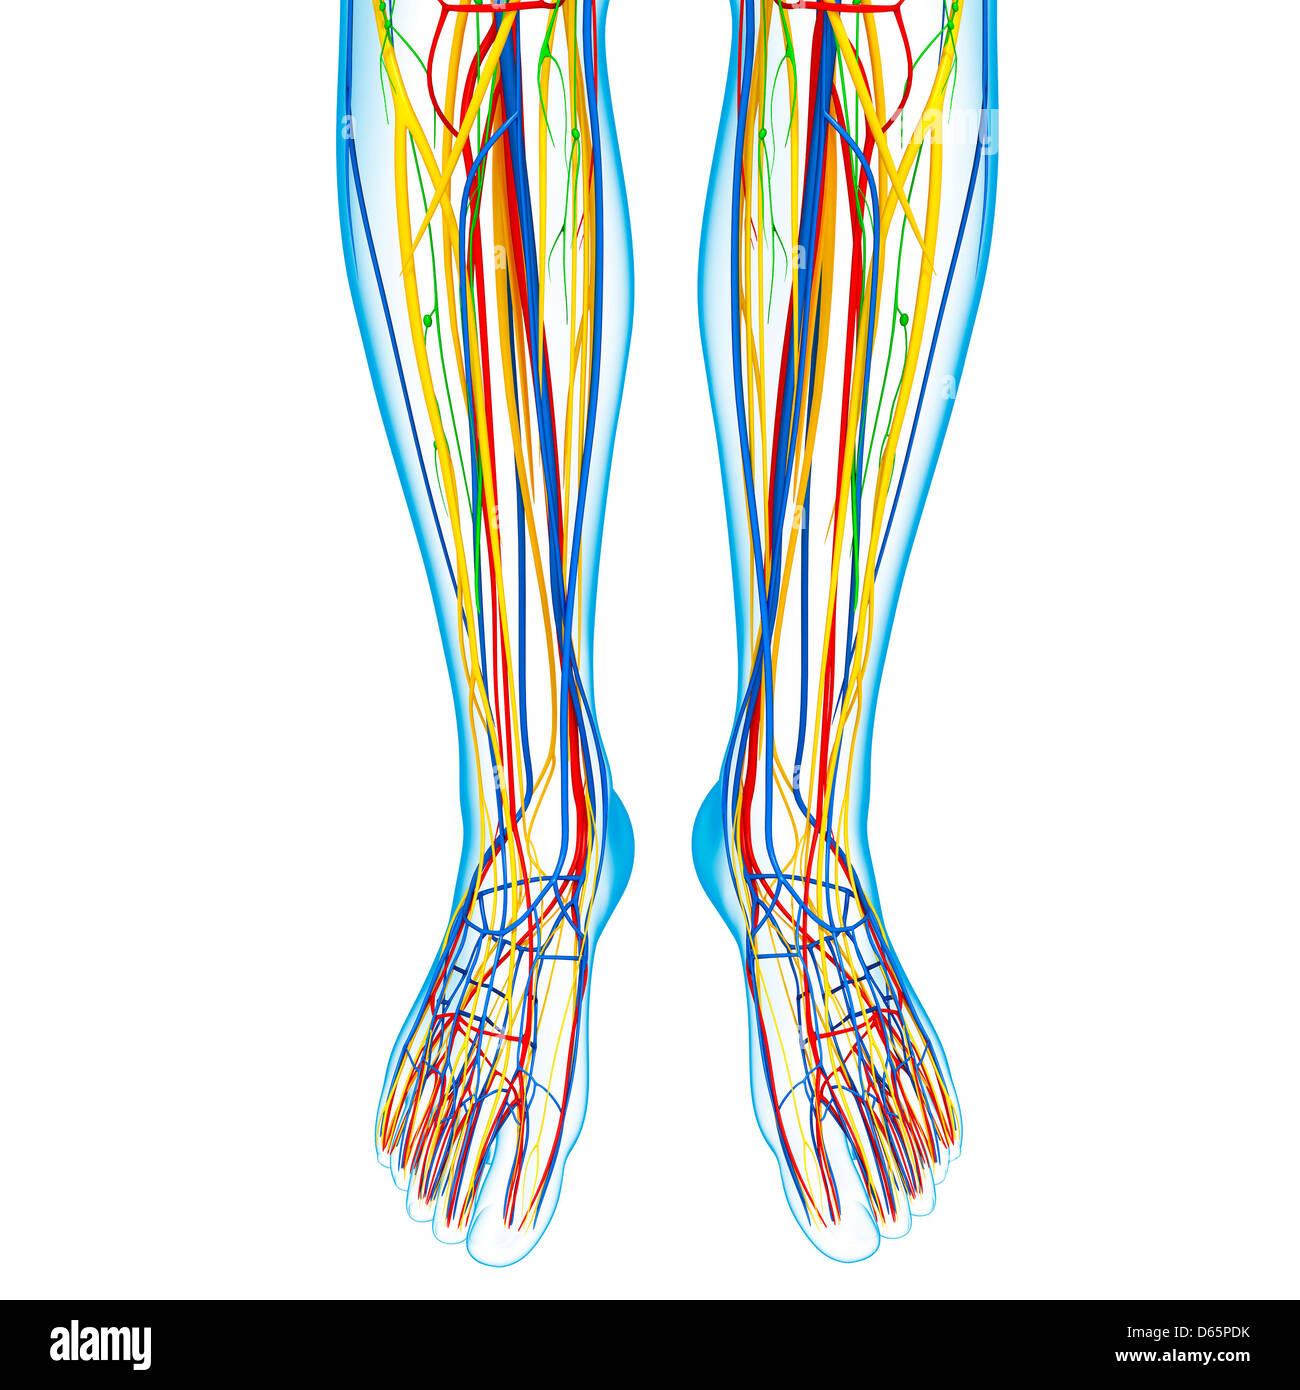 Lower leg anatomy, artwork Stock Photo: 55446431 - Alamy